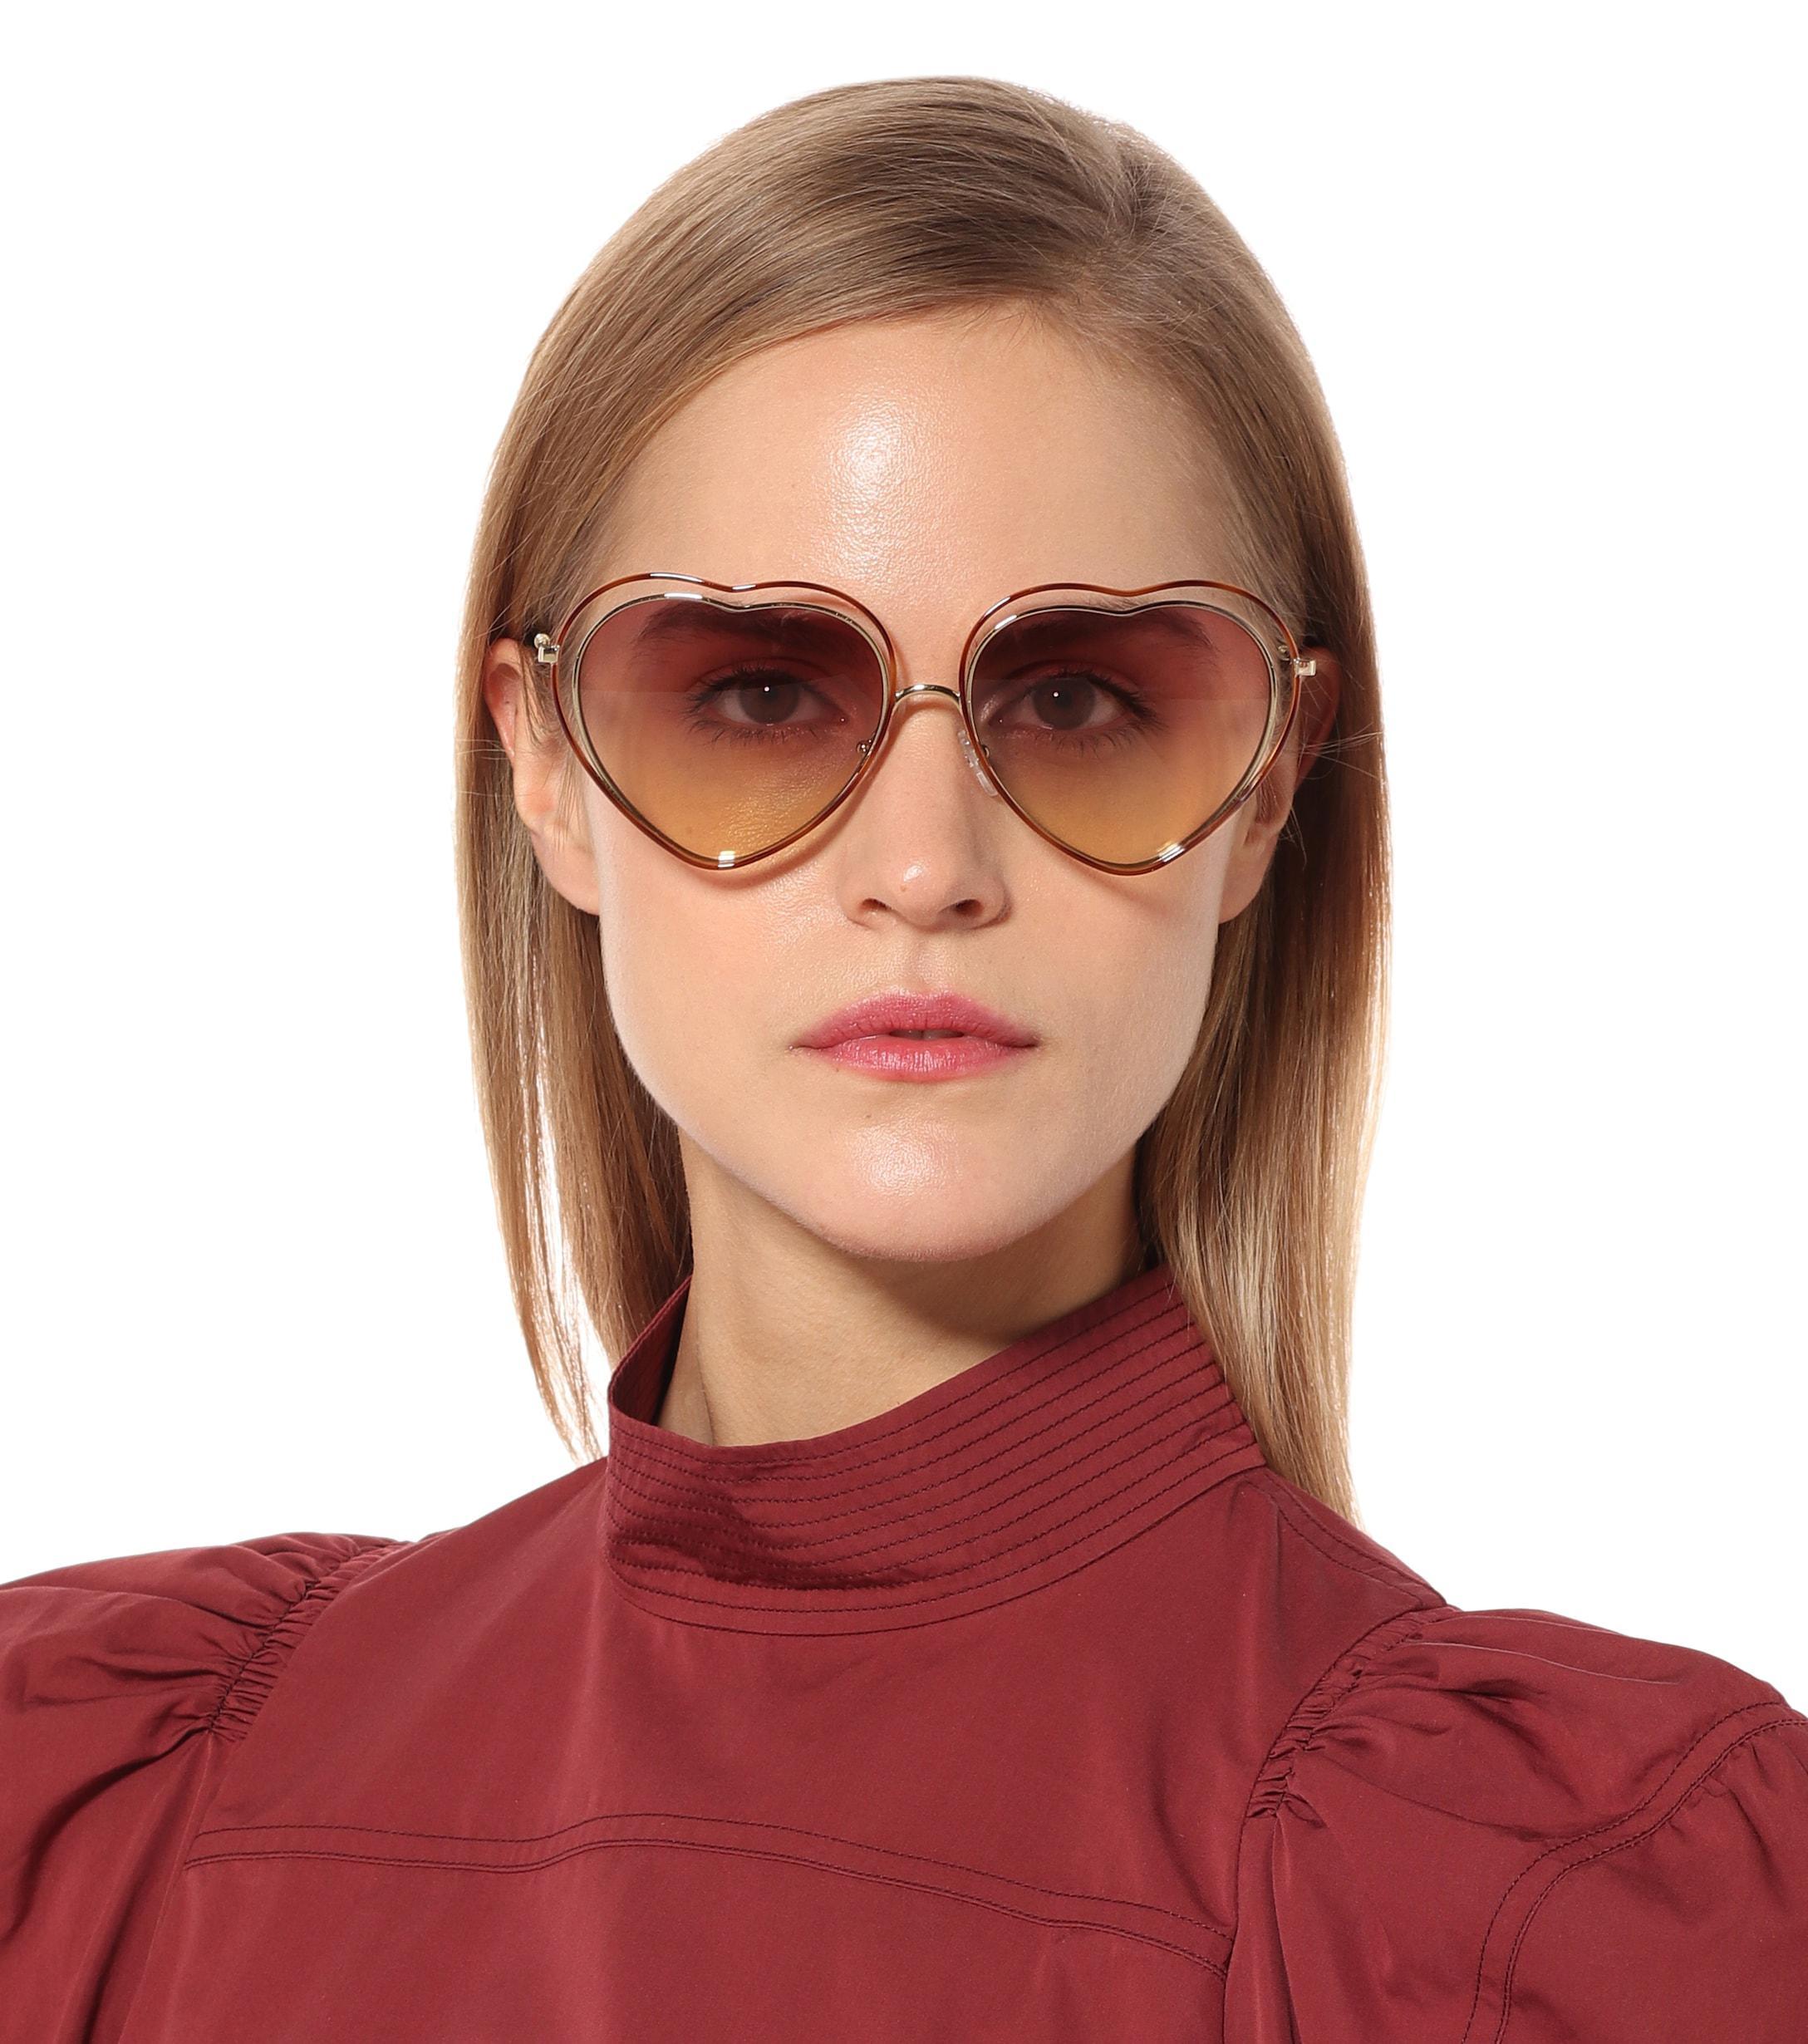 6cffa7e667a Poppy Heart-shaped Sunglasses - Lyst. View fullscreen